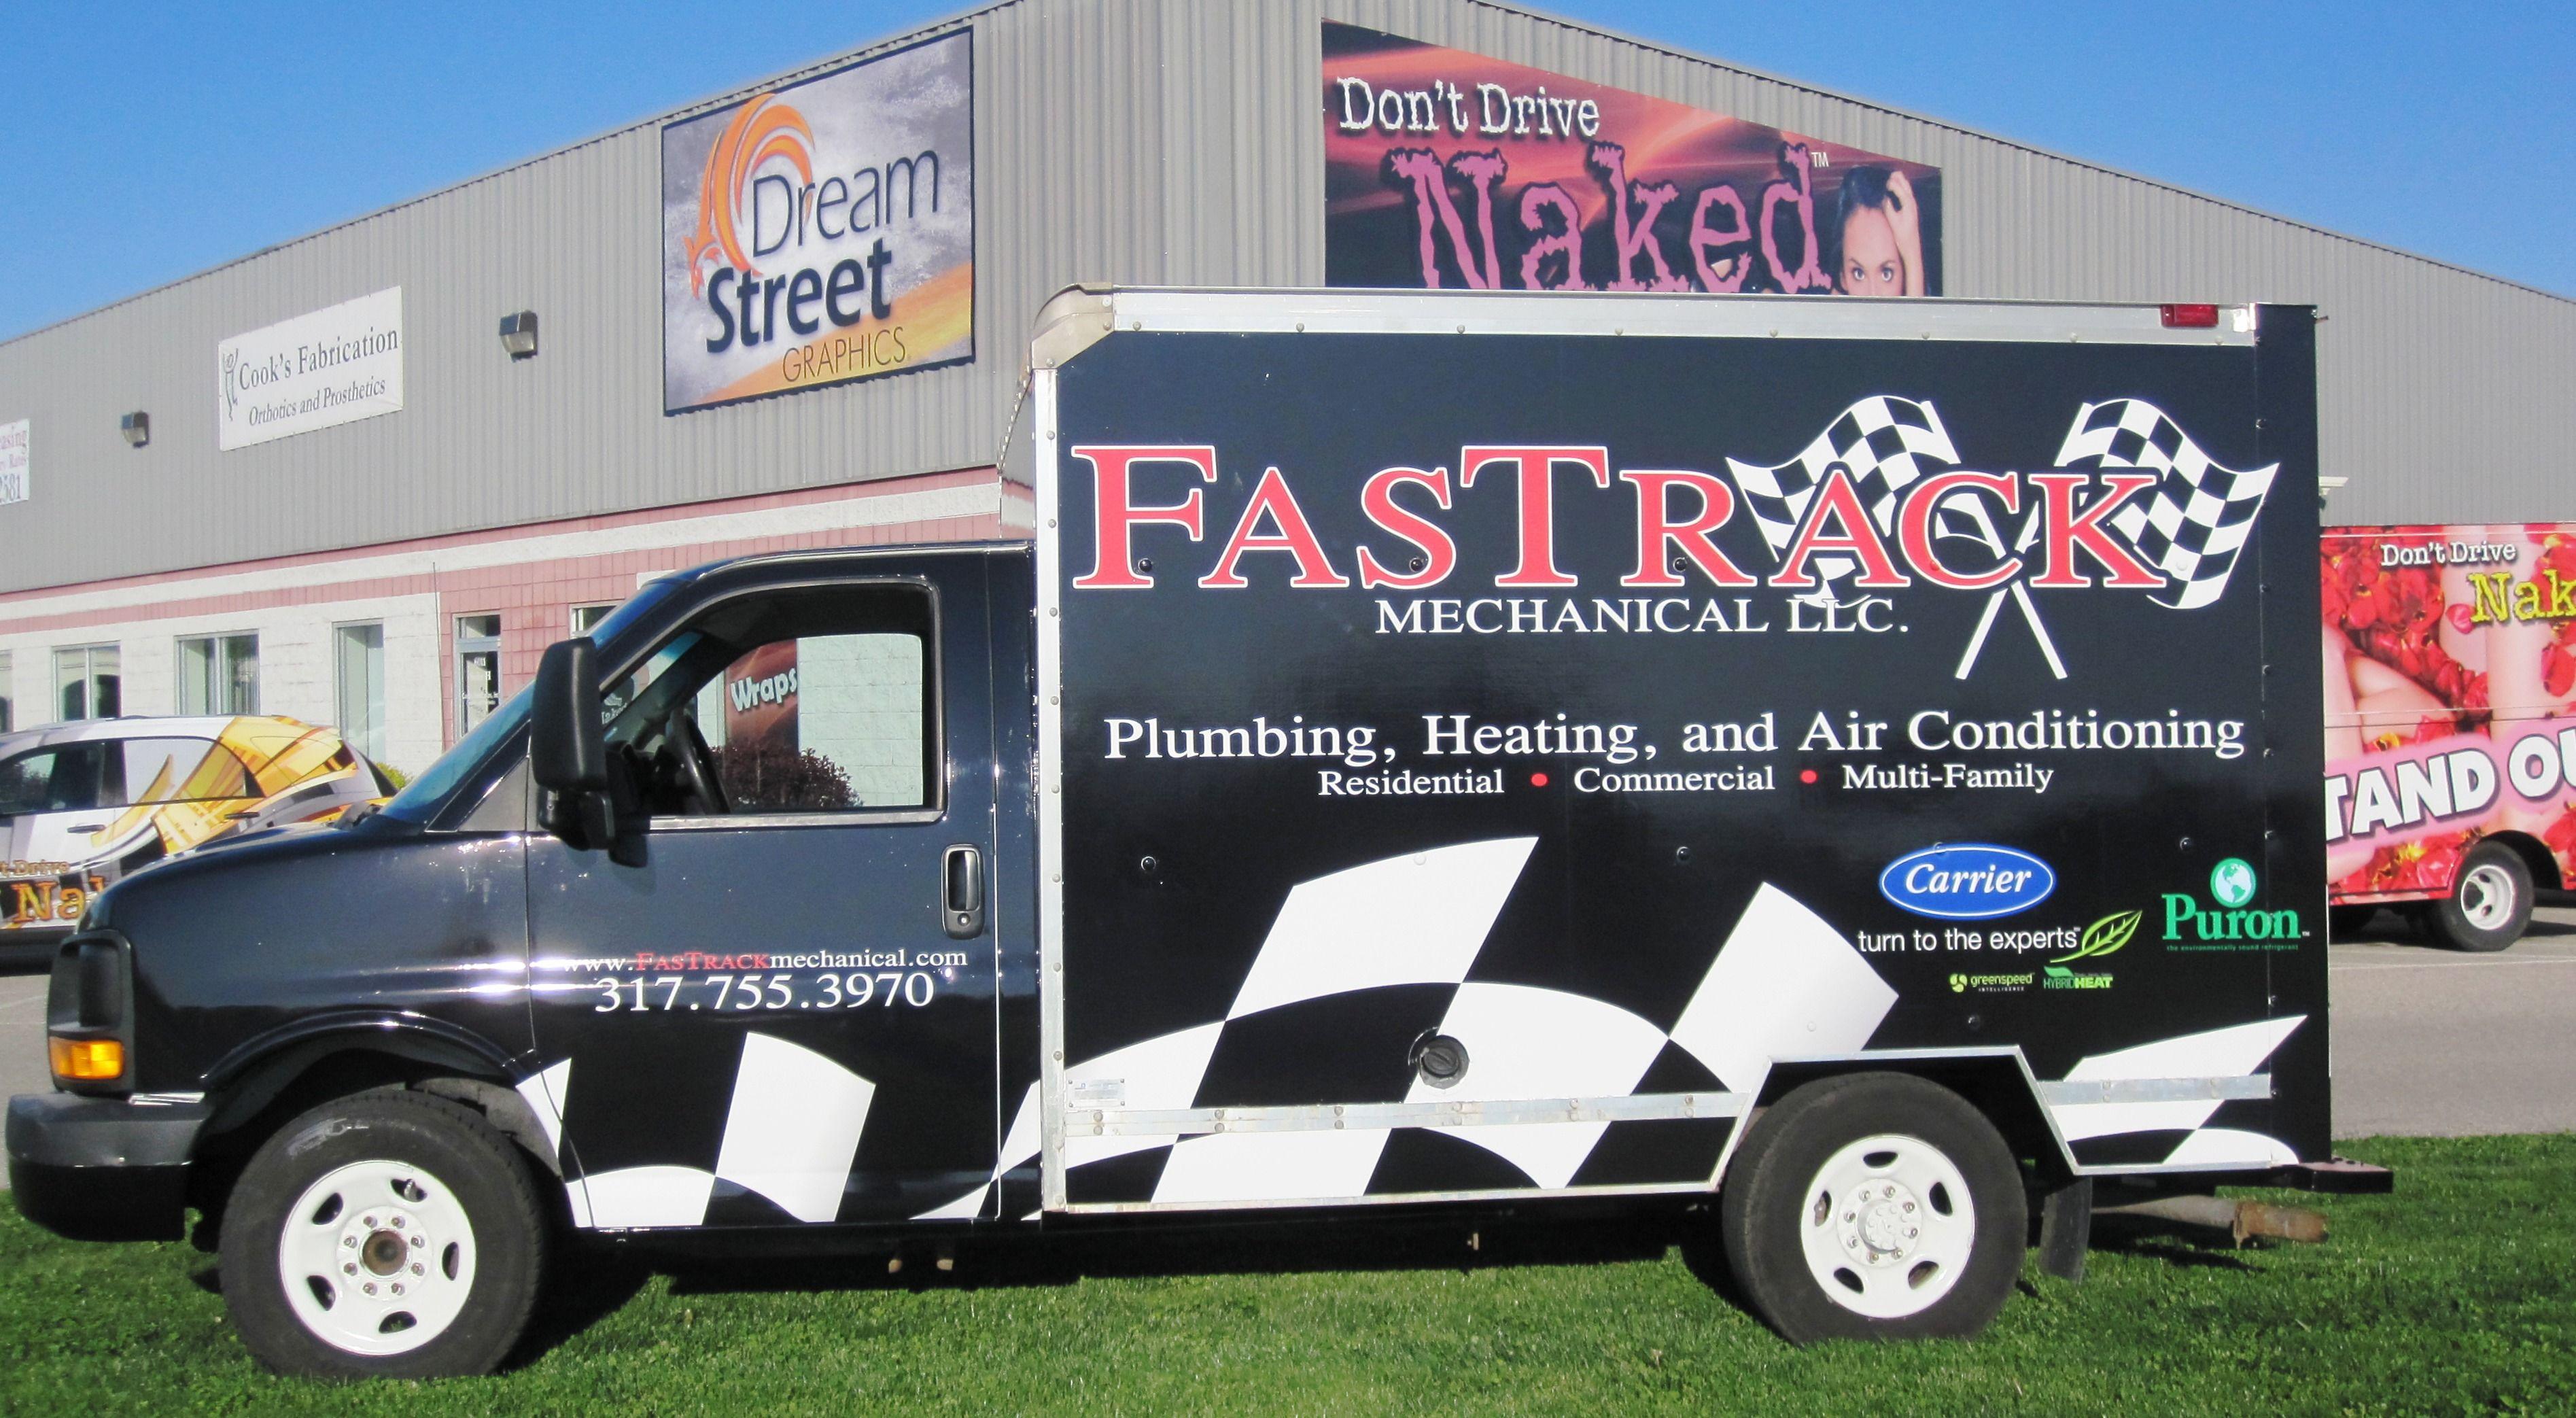 FasTrack Mechanical LLC / by Dream Street Graphics / box